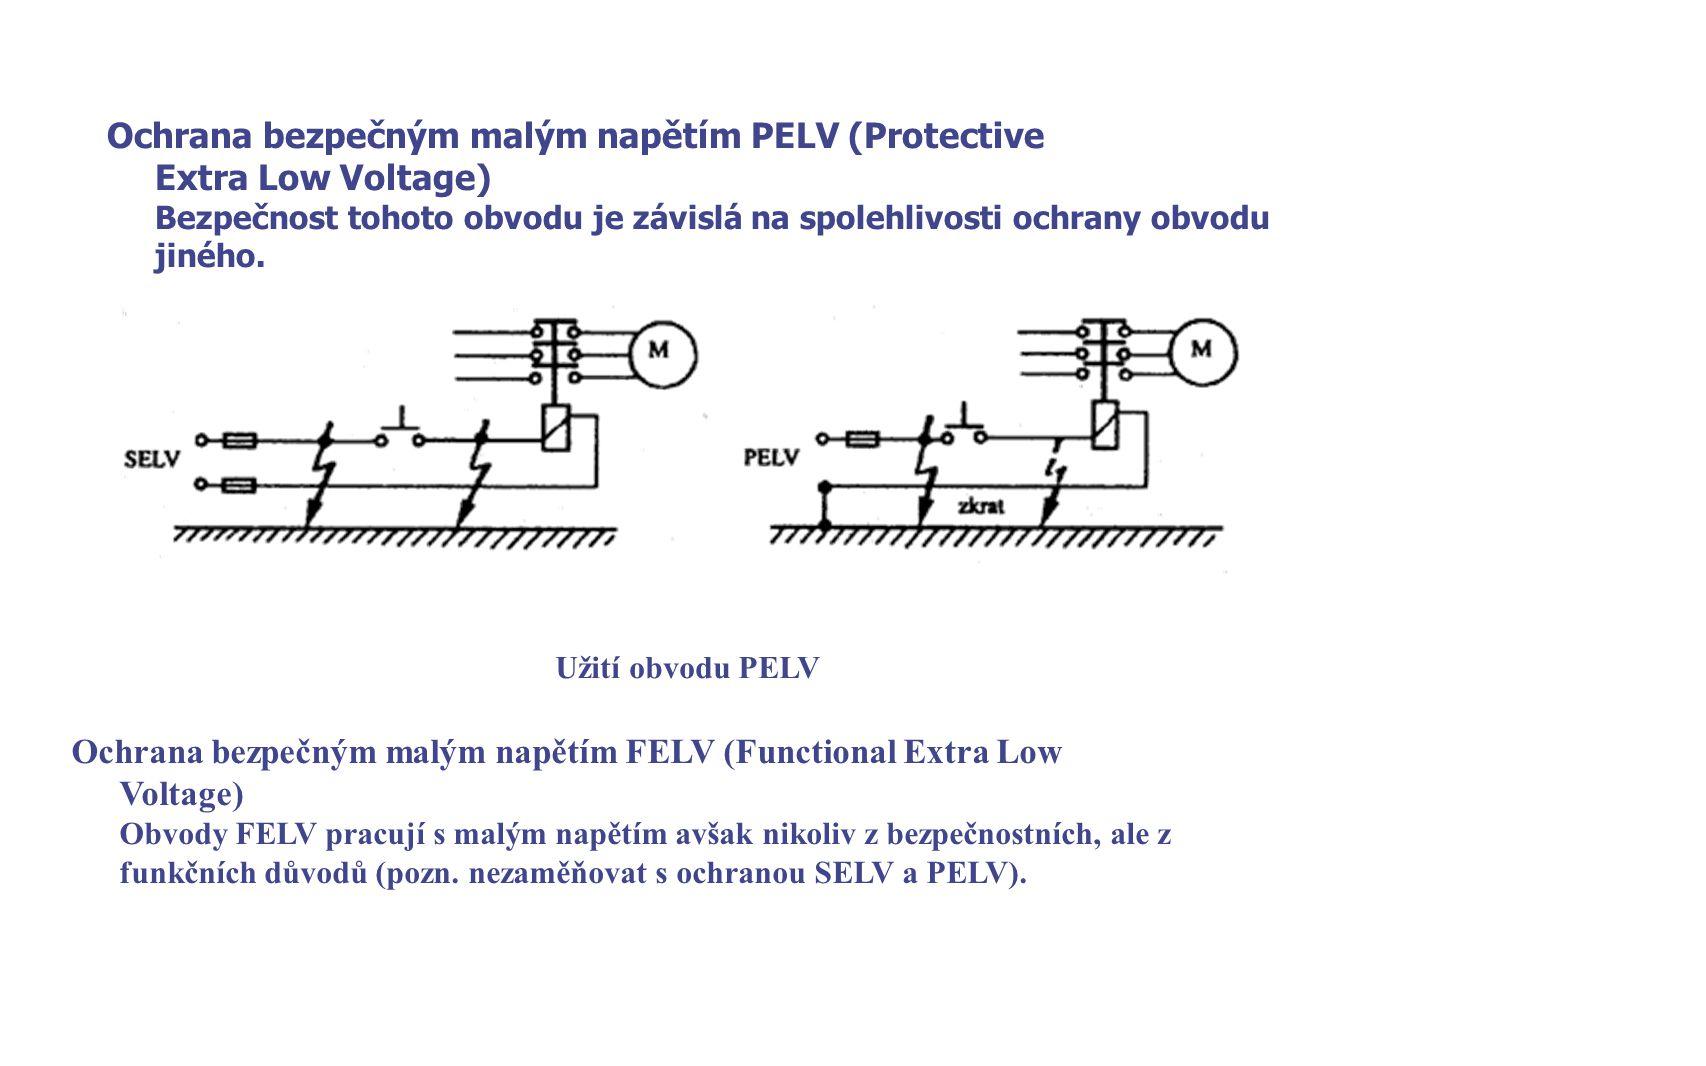 Ochrana bezpečným malým napětím PELV (Protective Extra Low Voltage) Bezpečnost tohoto obvodu je závislá na spolehlivosti ochrany obvodu jiného. Užití